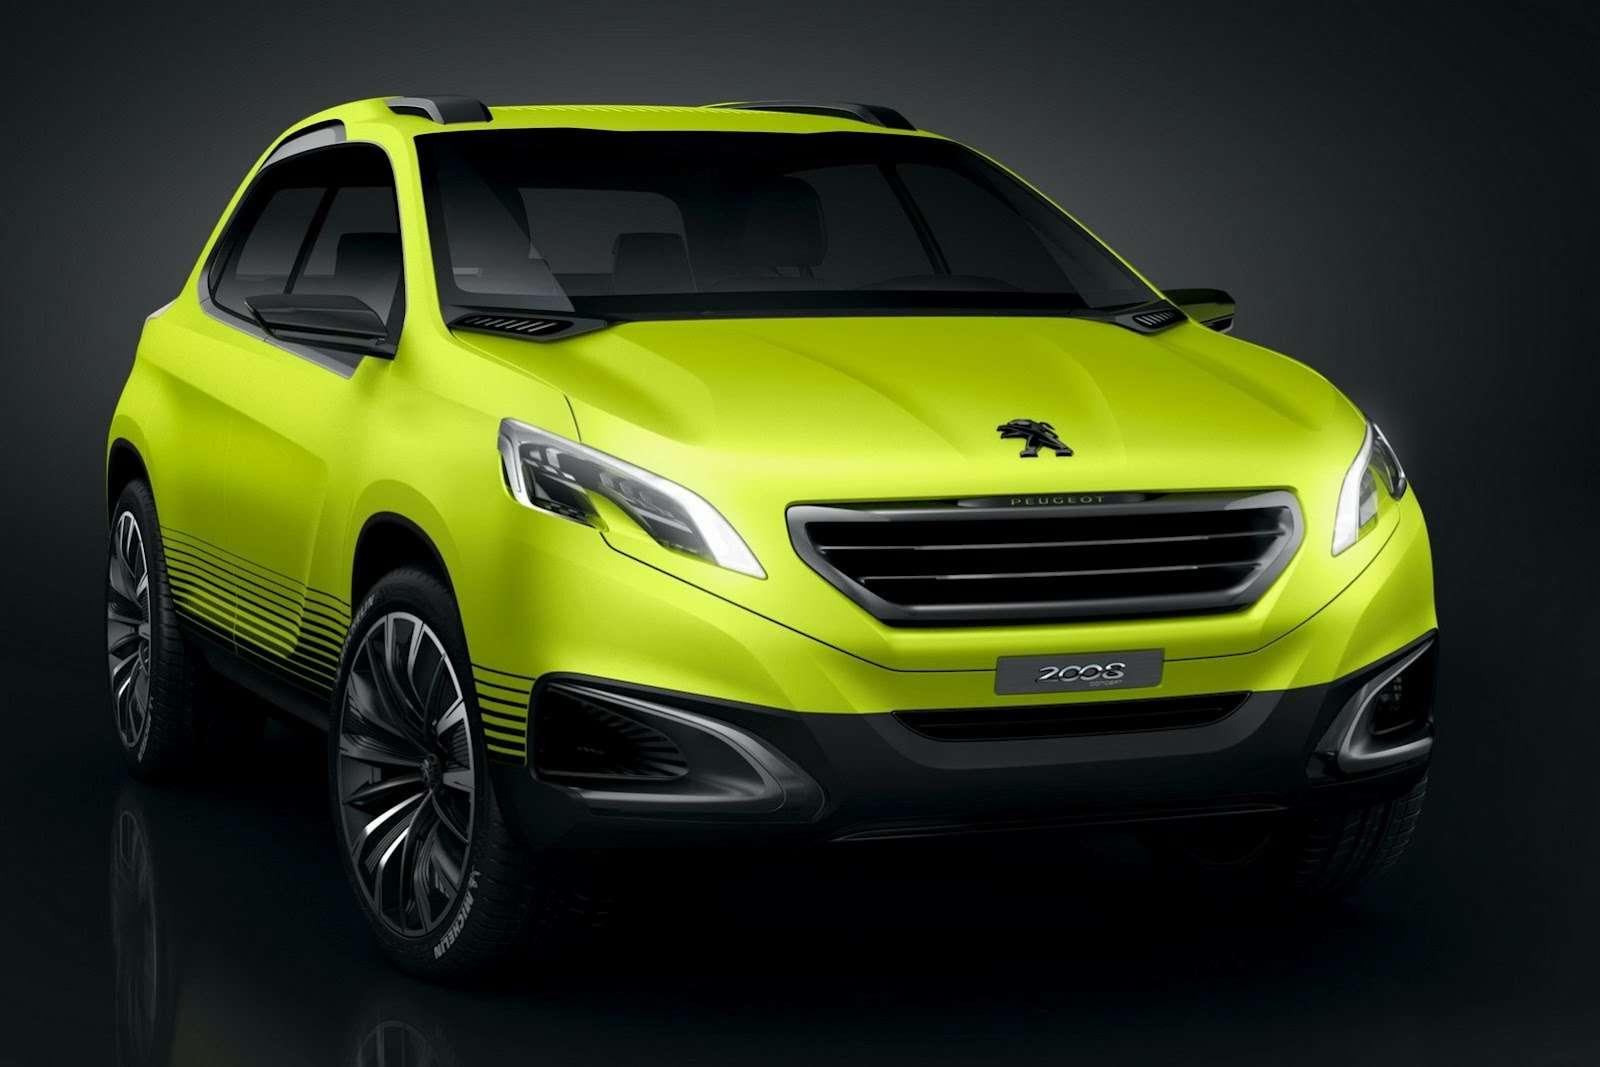 _no_copyright_Peugeot-2008-Concept-5